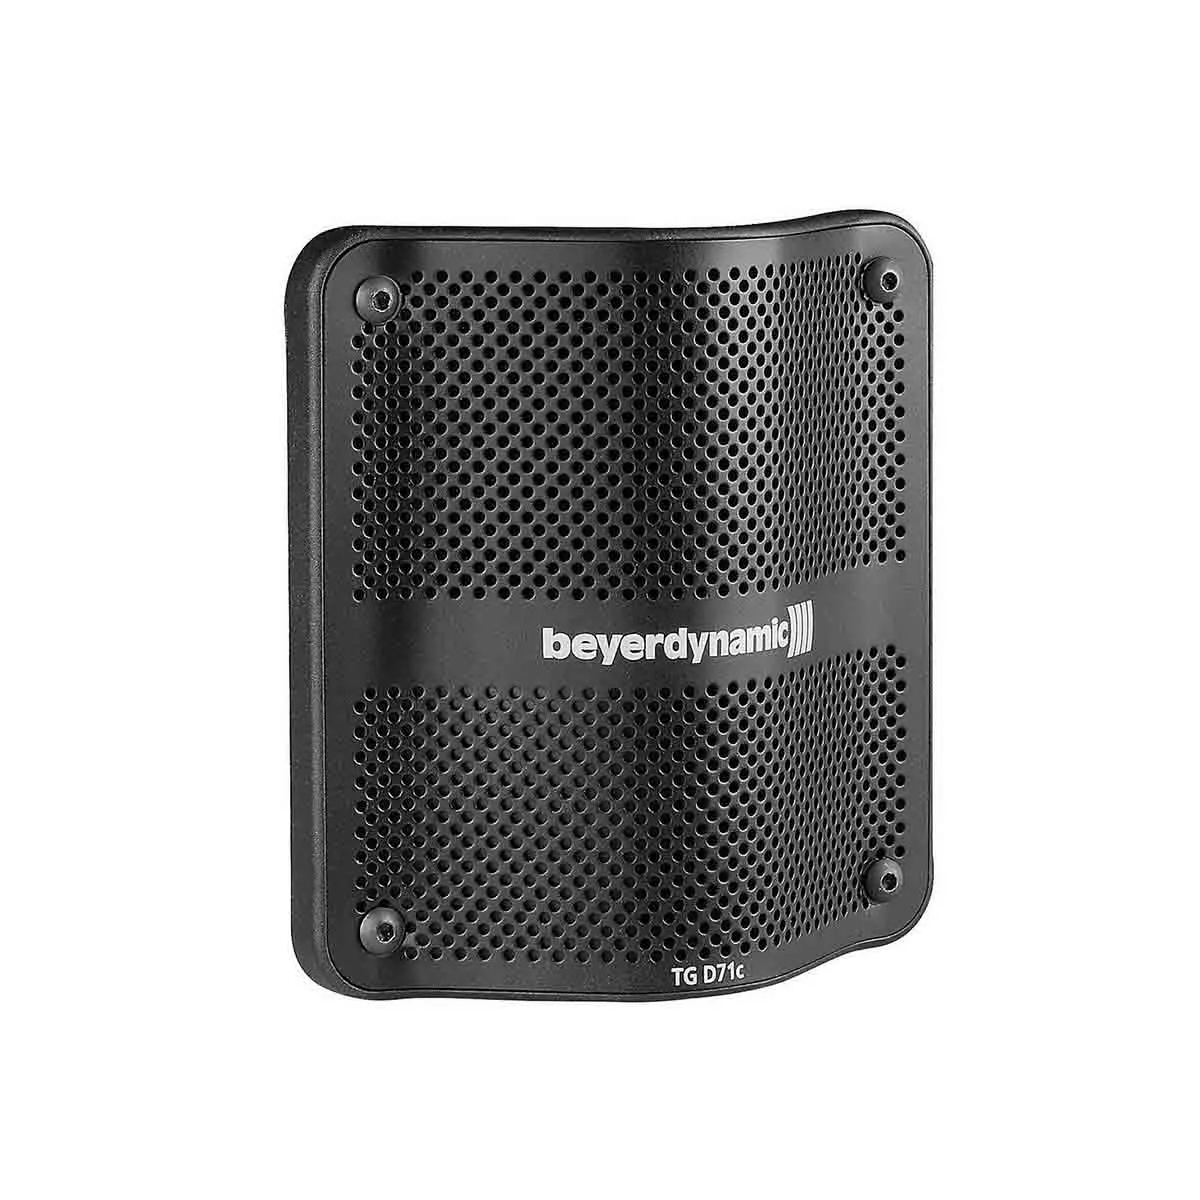 Microfone de Percurssão Beyerdynamic TG D71C